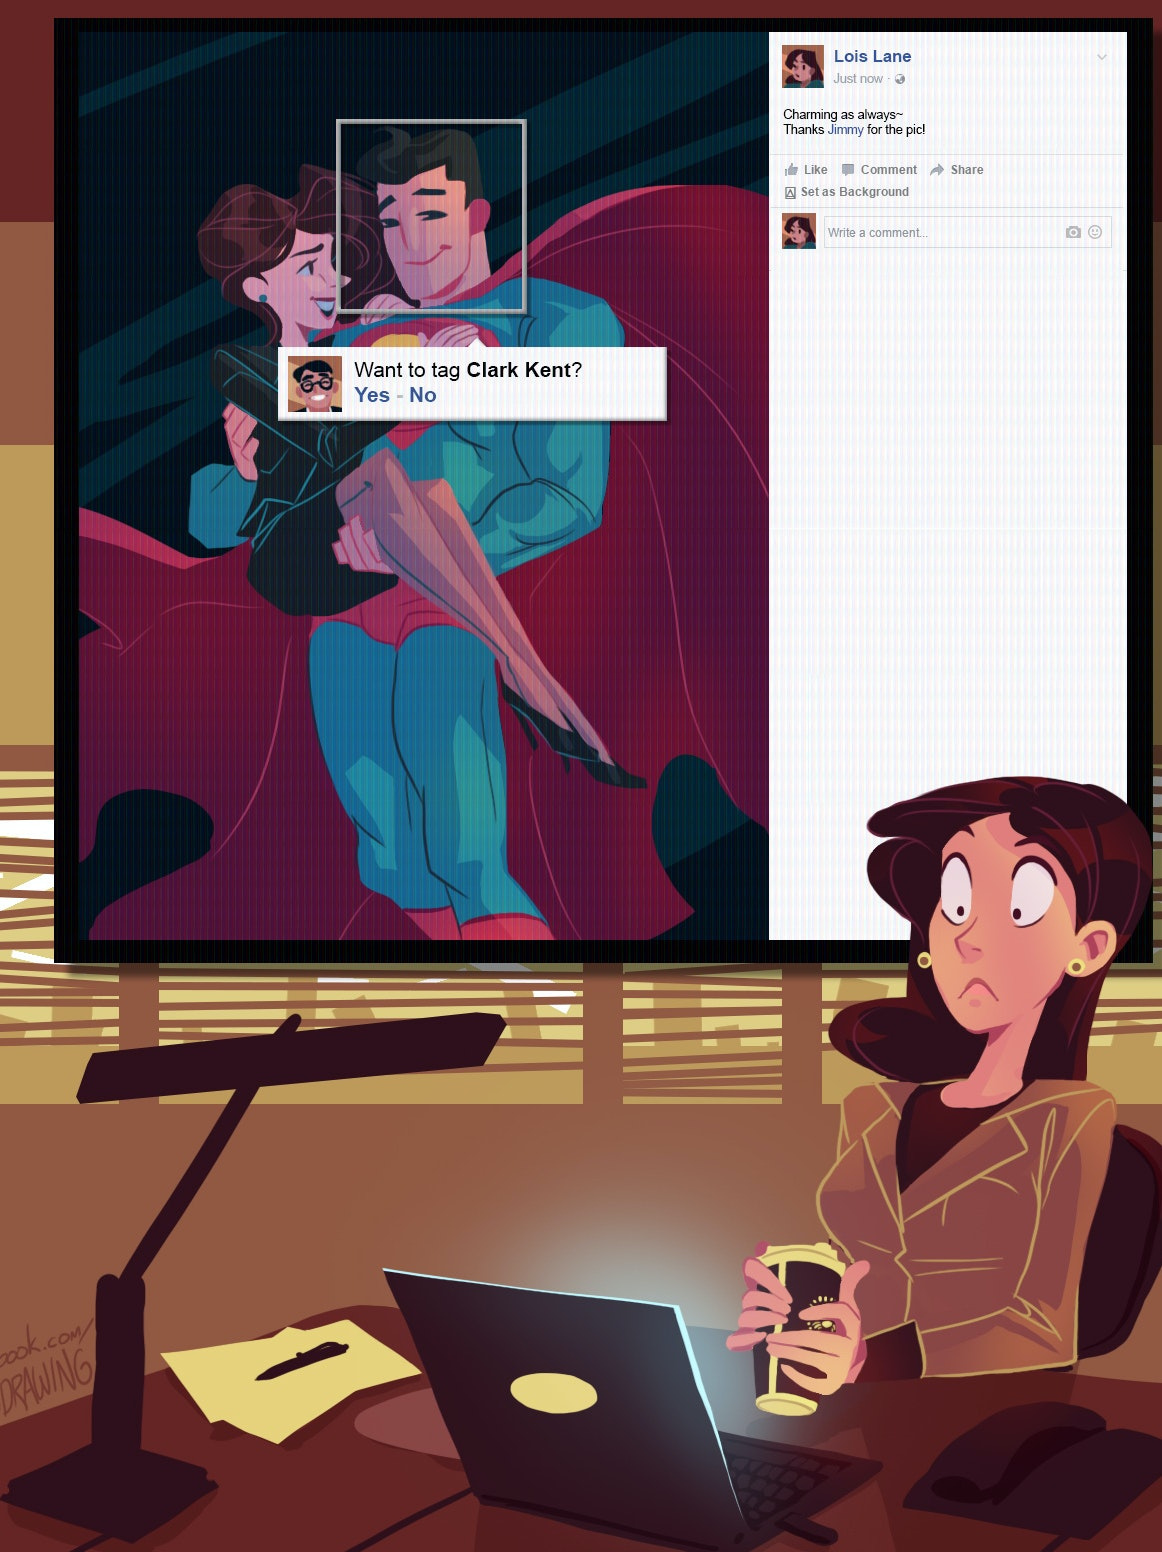 Fanart of Superman, Lois Lane, and Facebook's Algorithm